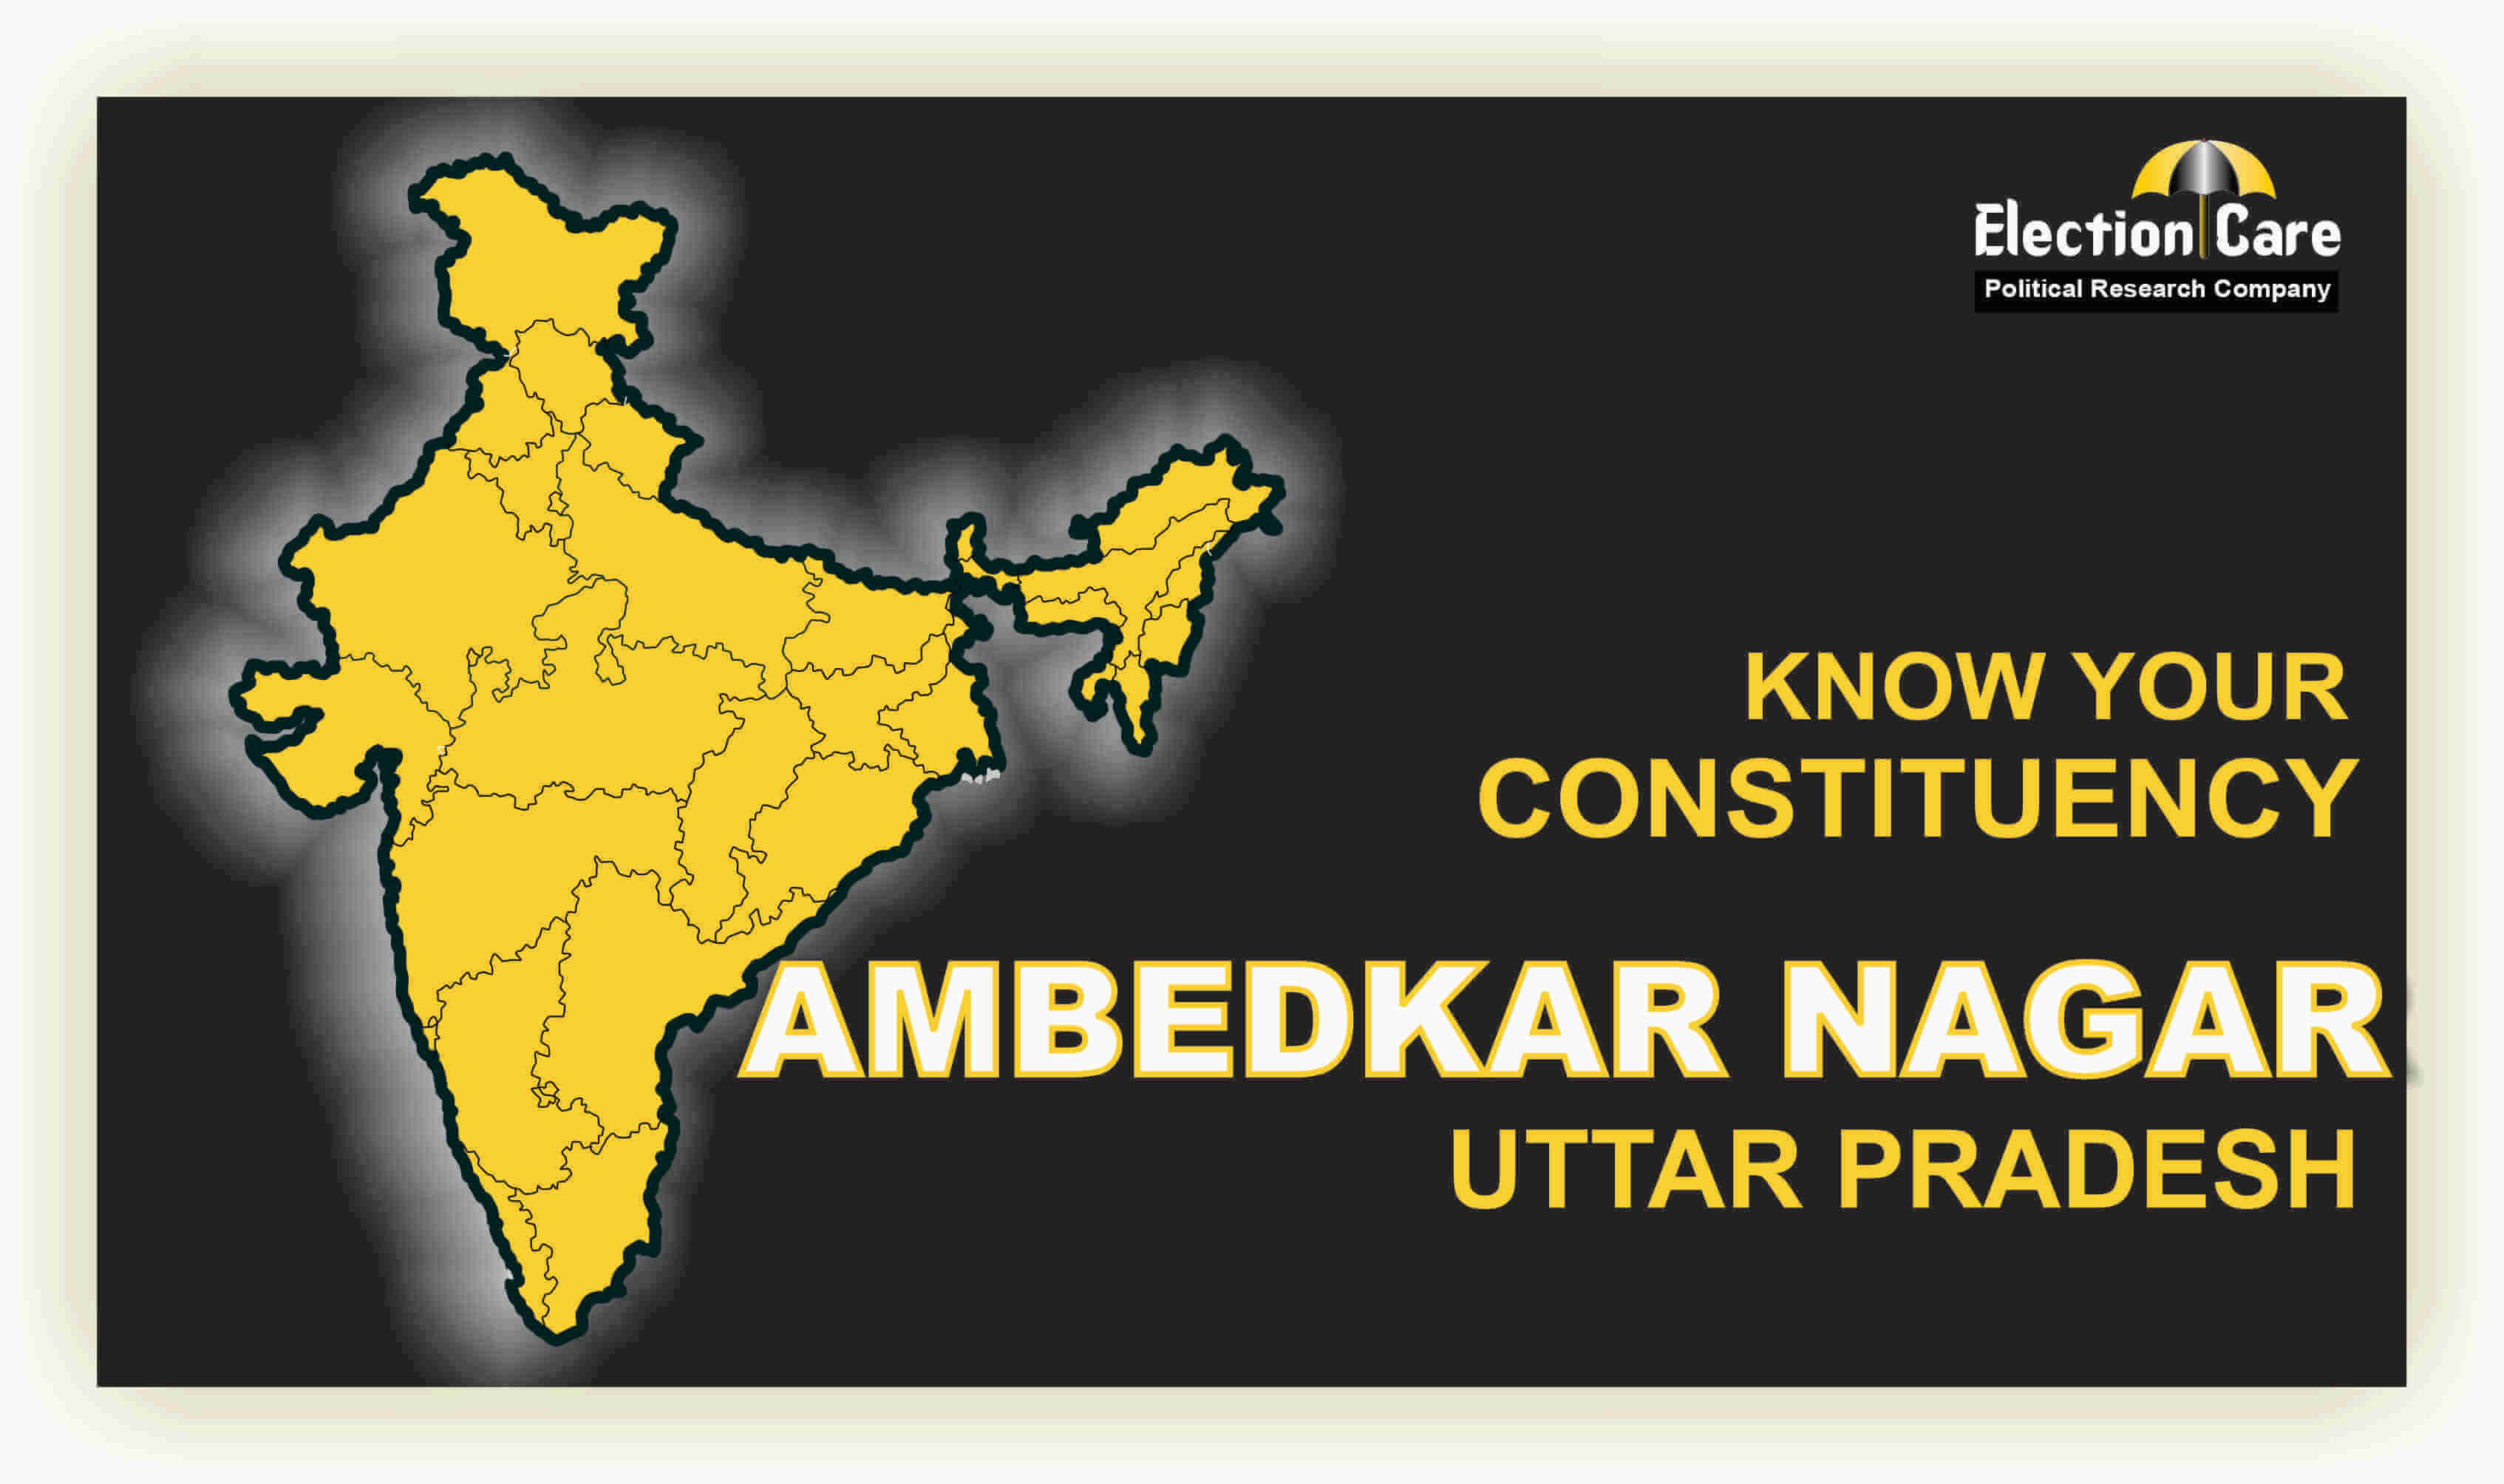 Ambedkar Nagar Parliament Election Result